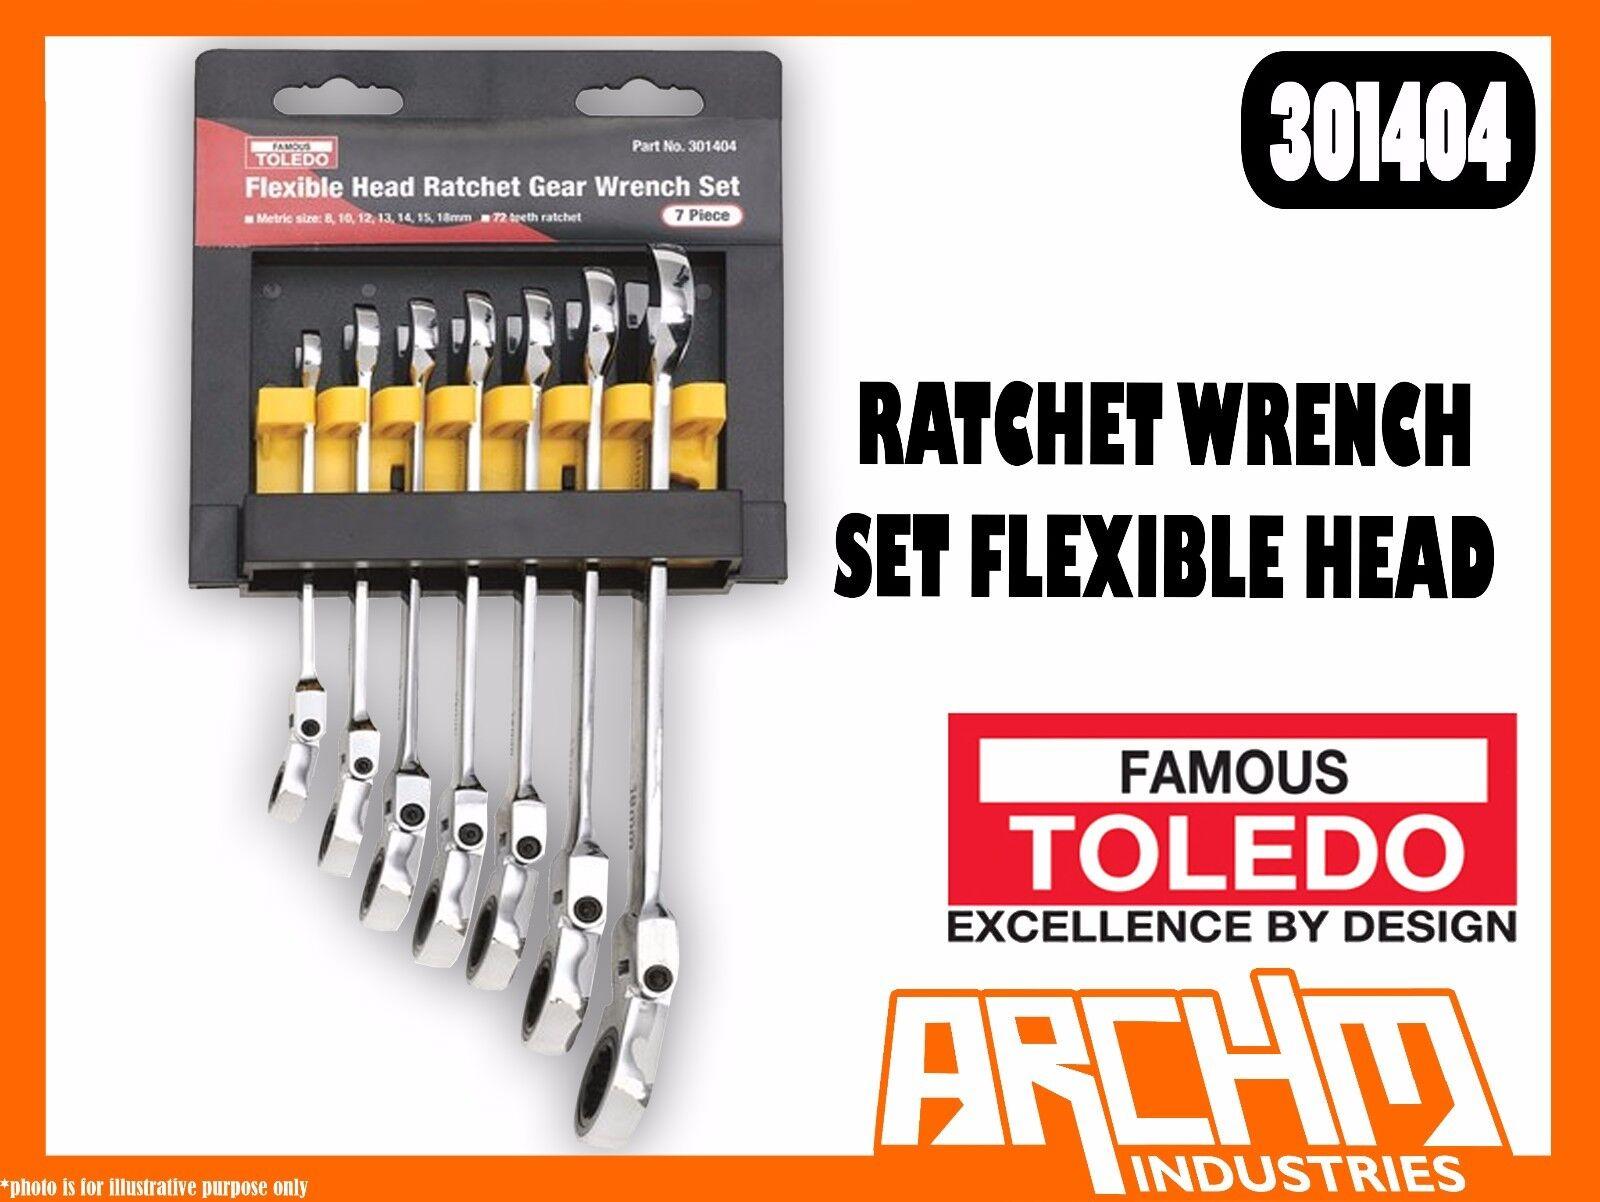 TOLEDO 301404 - RATCHET WRENCH SET FLEXIBLE HEAD - METRIC 7 PC. 8-18MM RING OPEN